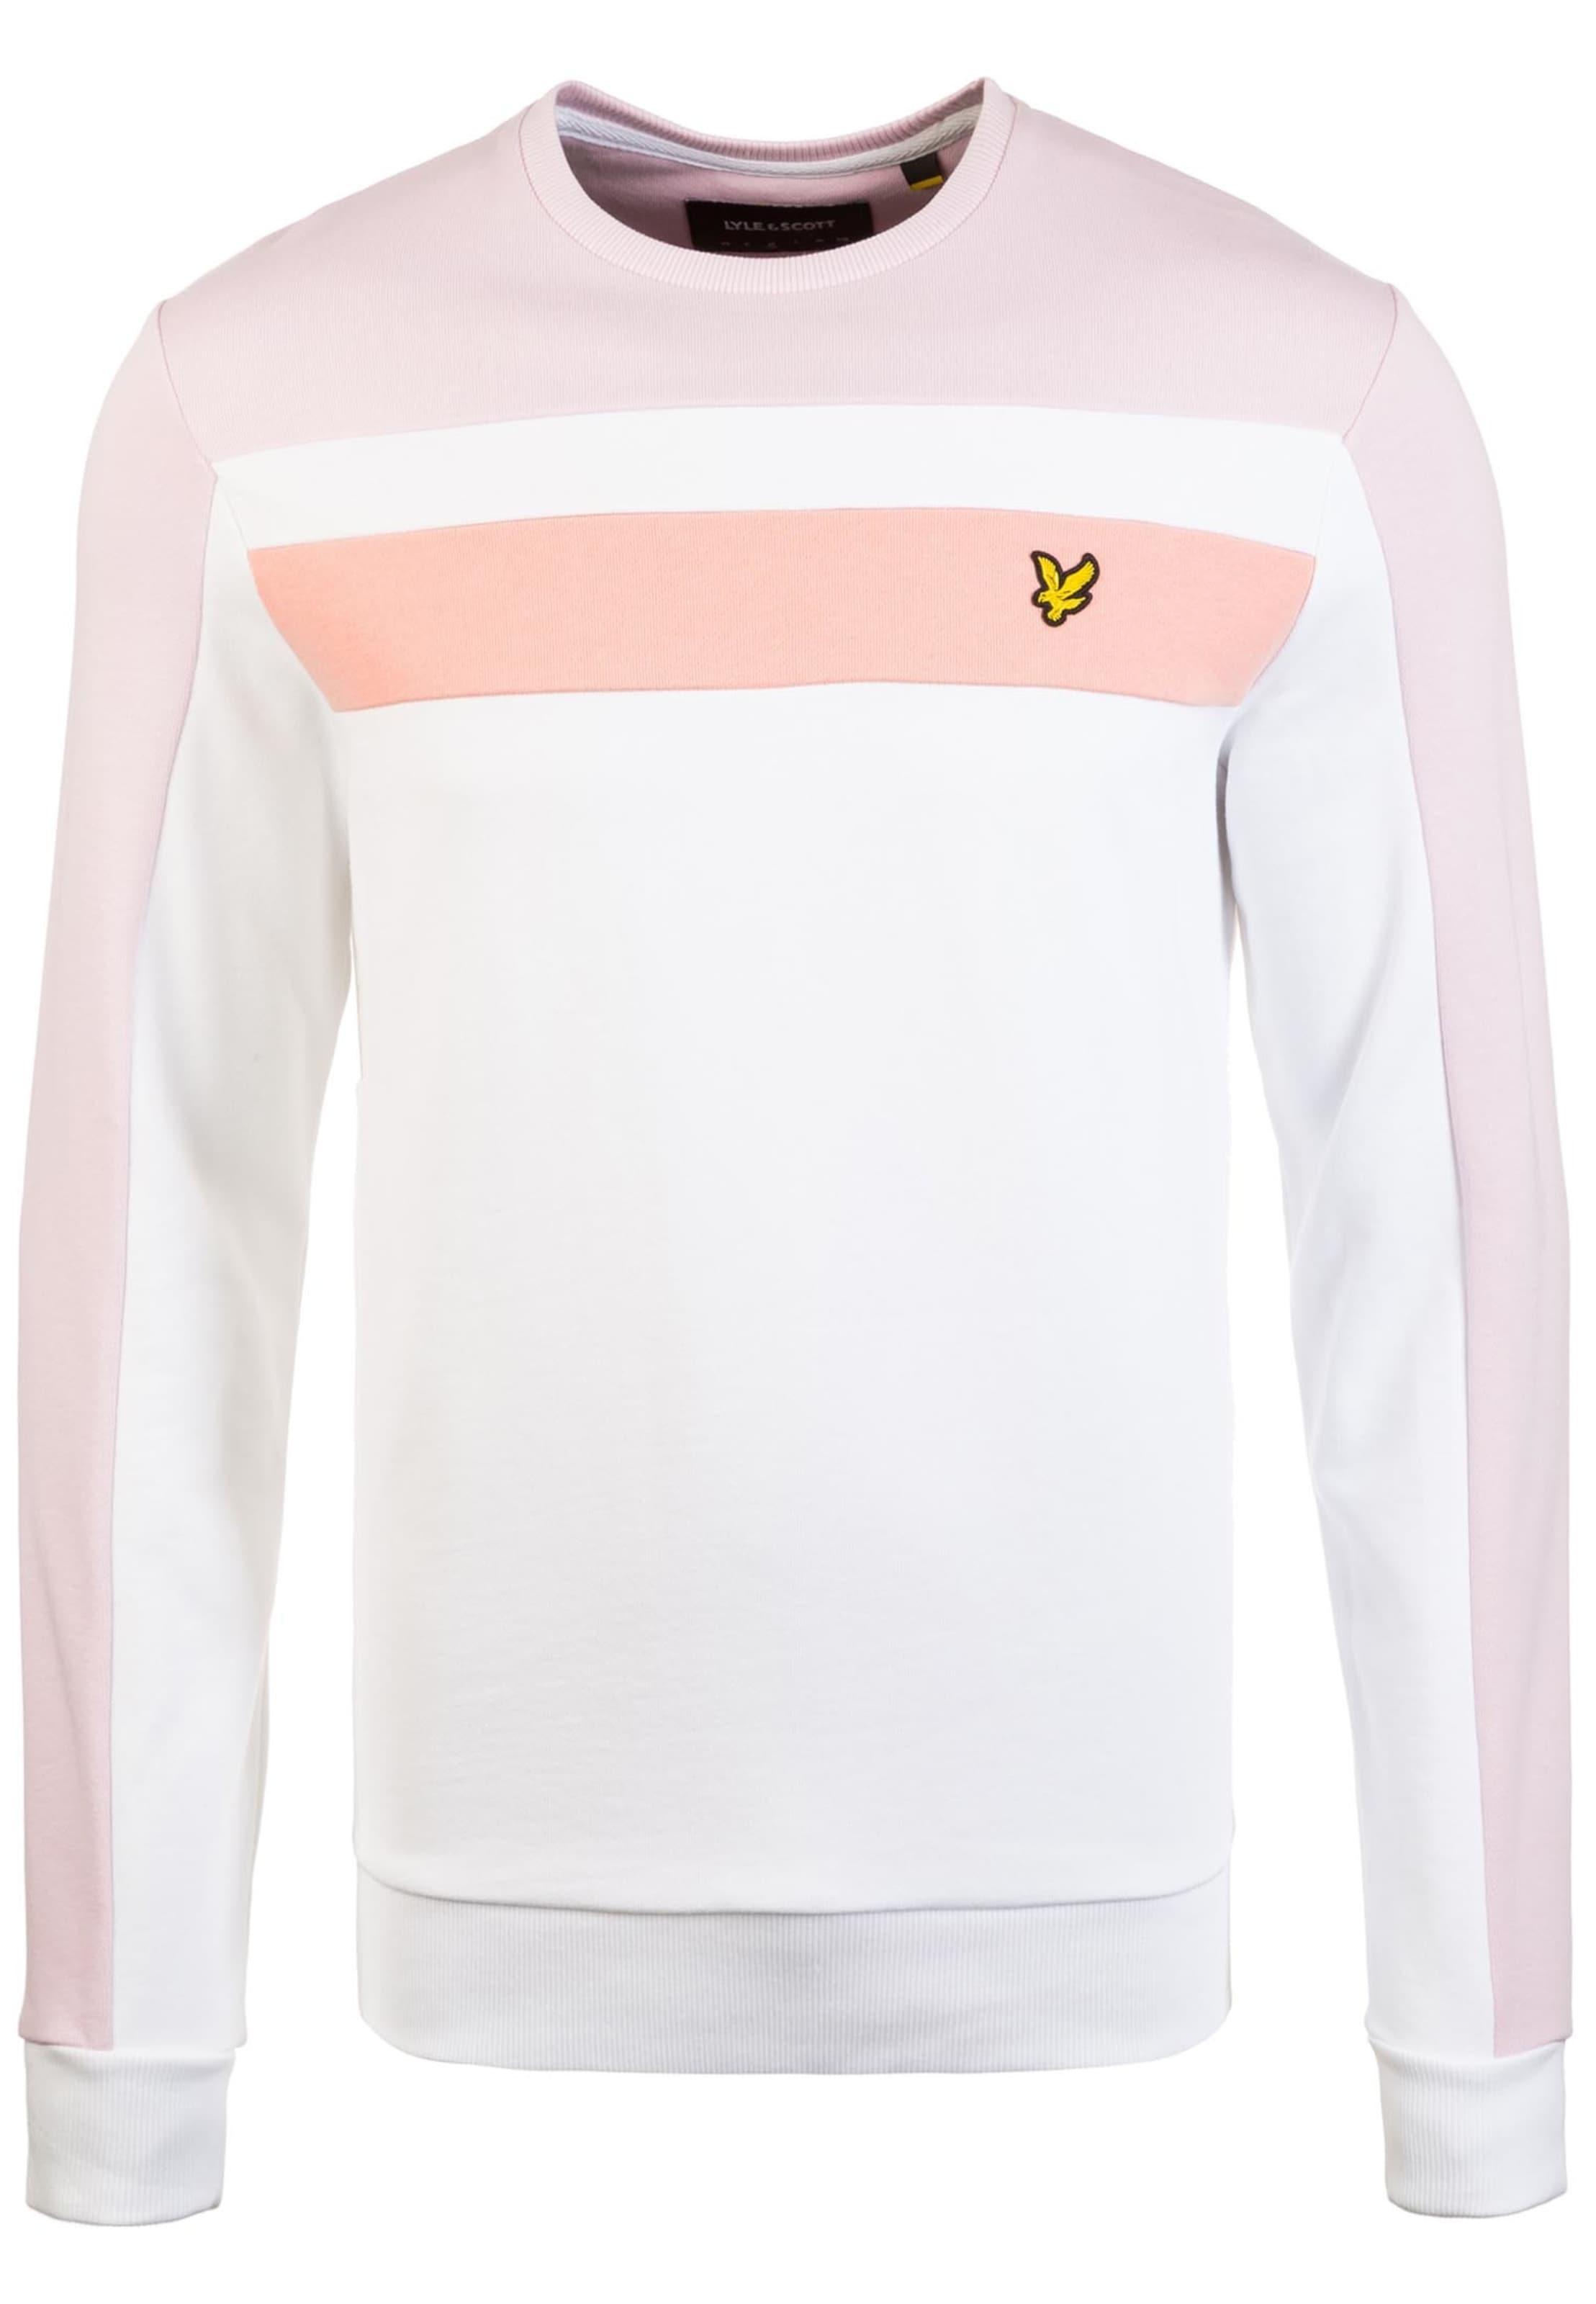 Scott shirt Blanc Sweat En AbricotPoudre Lyleamp; KcTF1Jl